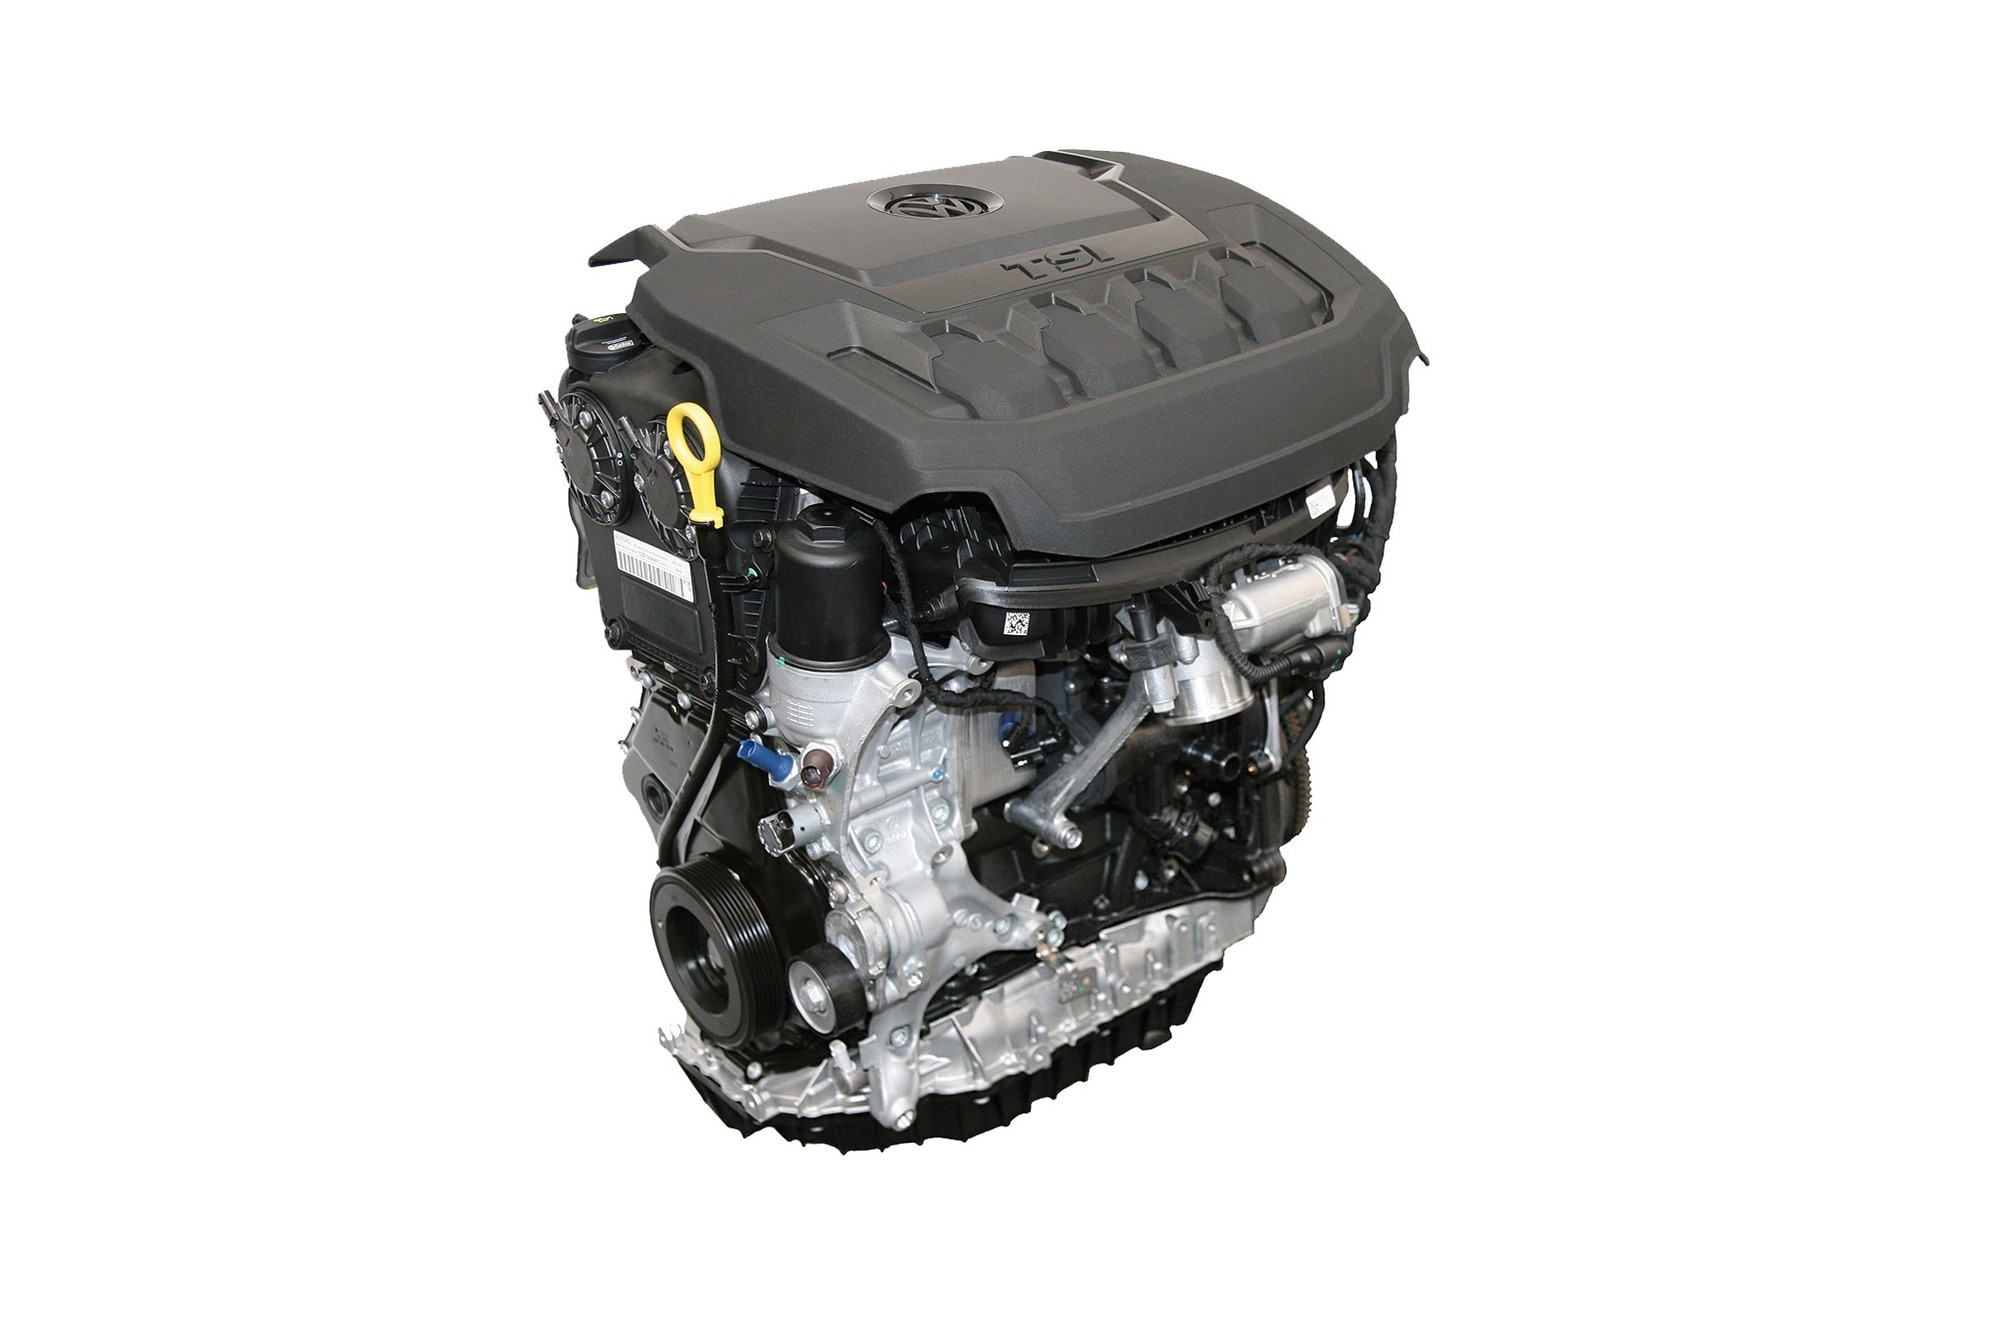 2010 Audi A4 2 0t Engine Diagram Trusted Wiring Diagrams 2006 0 Tfsi Enthusiast U2022 B7 Vacuum Line Located